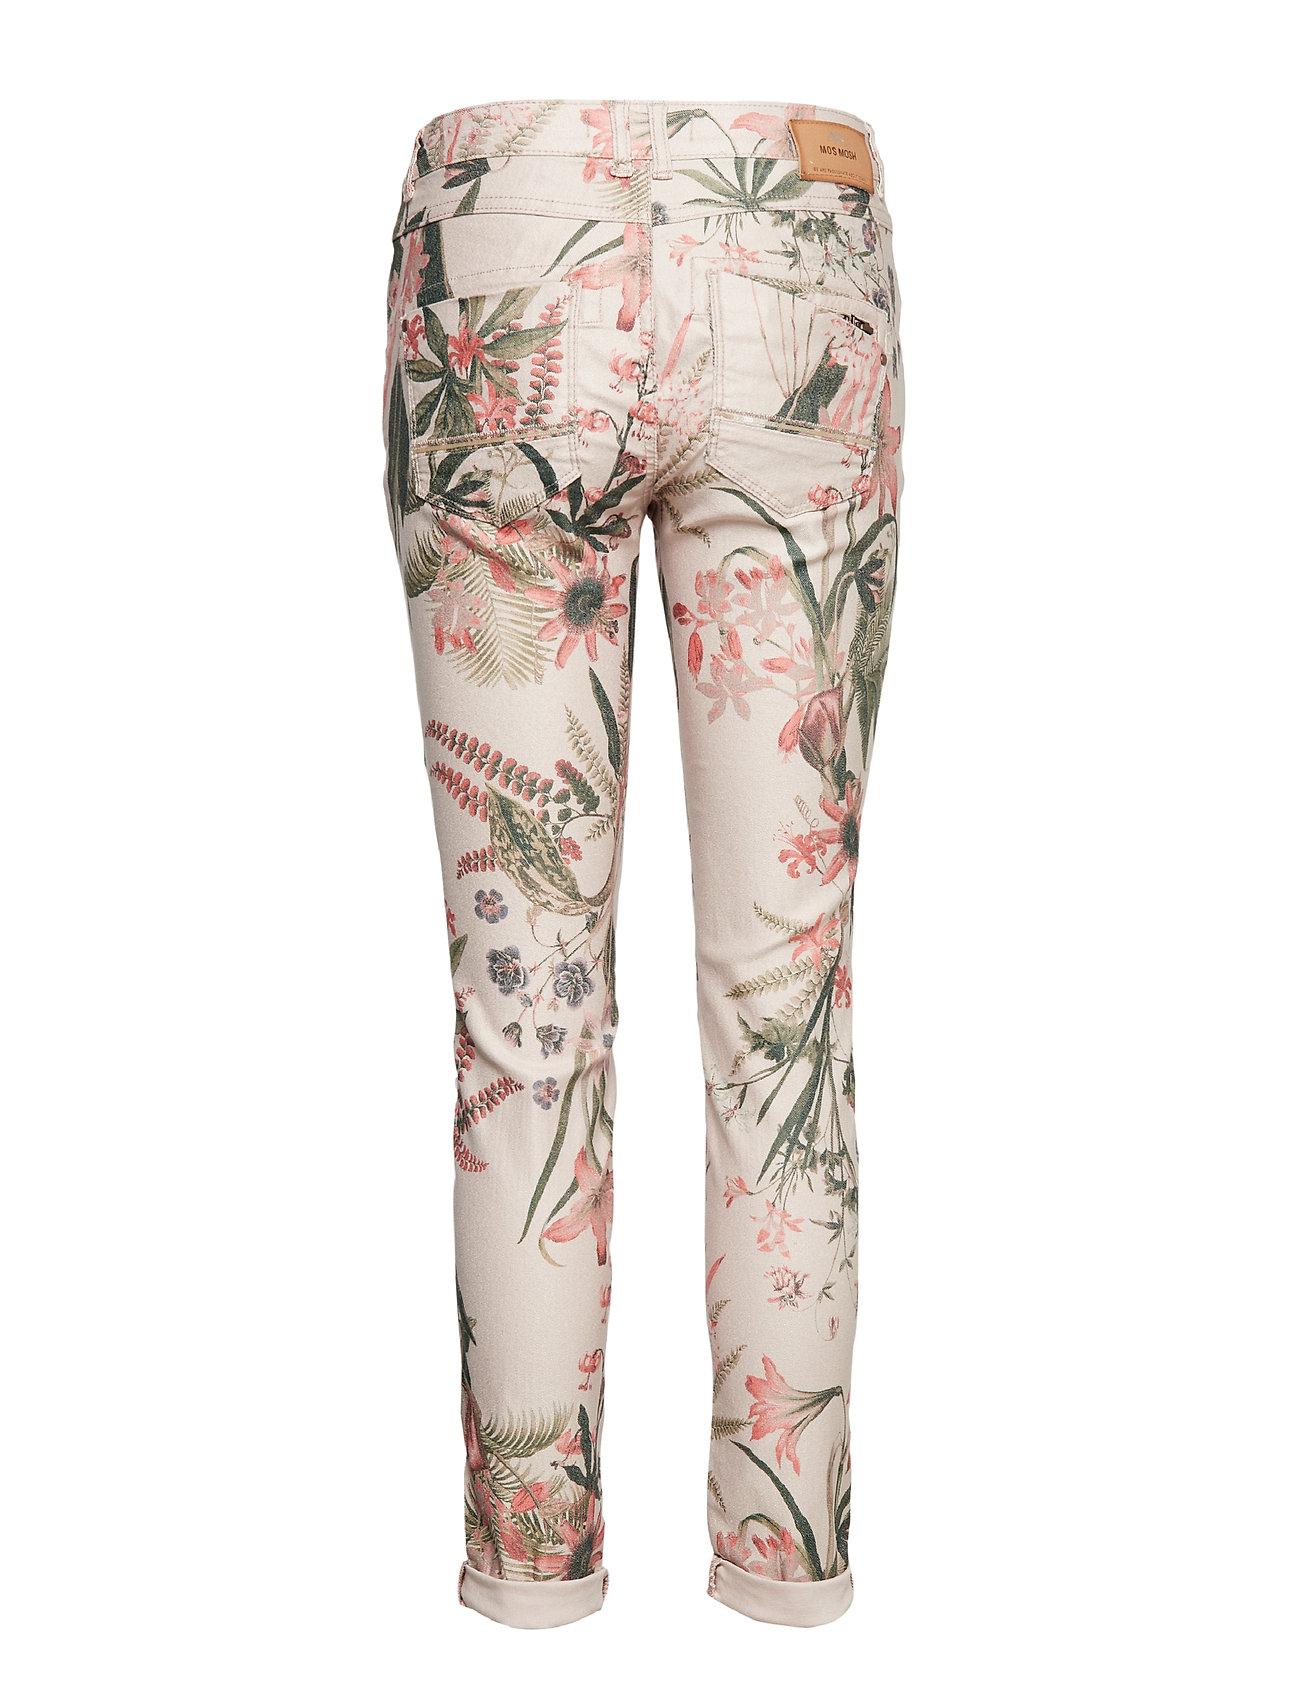 bea8c2df25d Naomi Shine Flower Pant Smalle Bukser Skinny Pants Multi/mønstret MOS MOSH